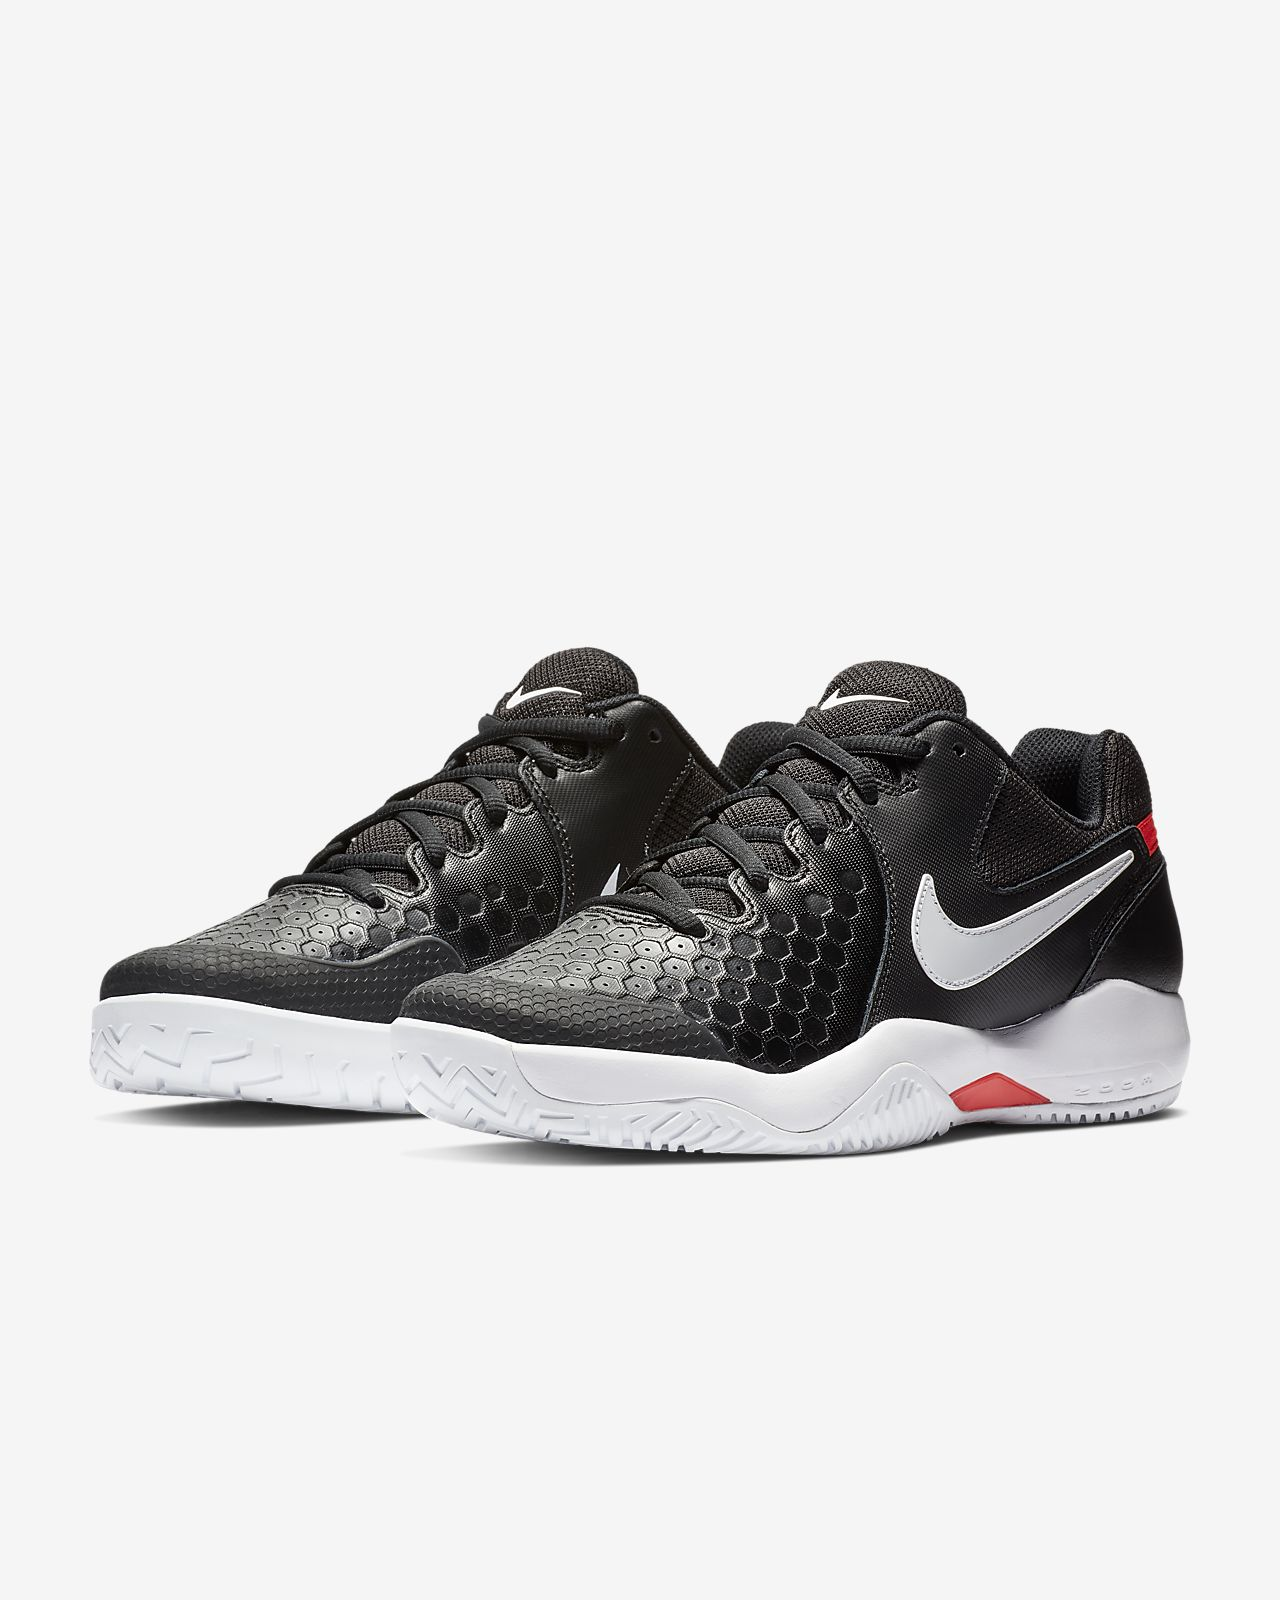 Sapatilhas de ténis piso duro NikeCourt Air Zoom Resistance para homem